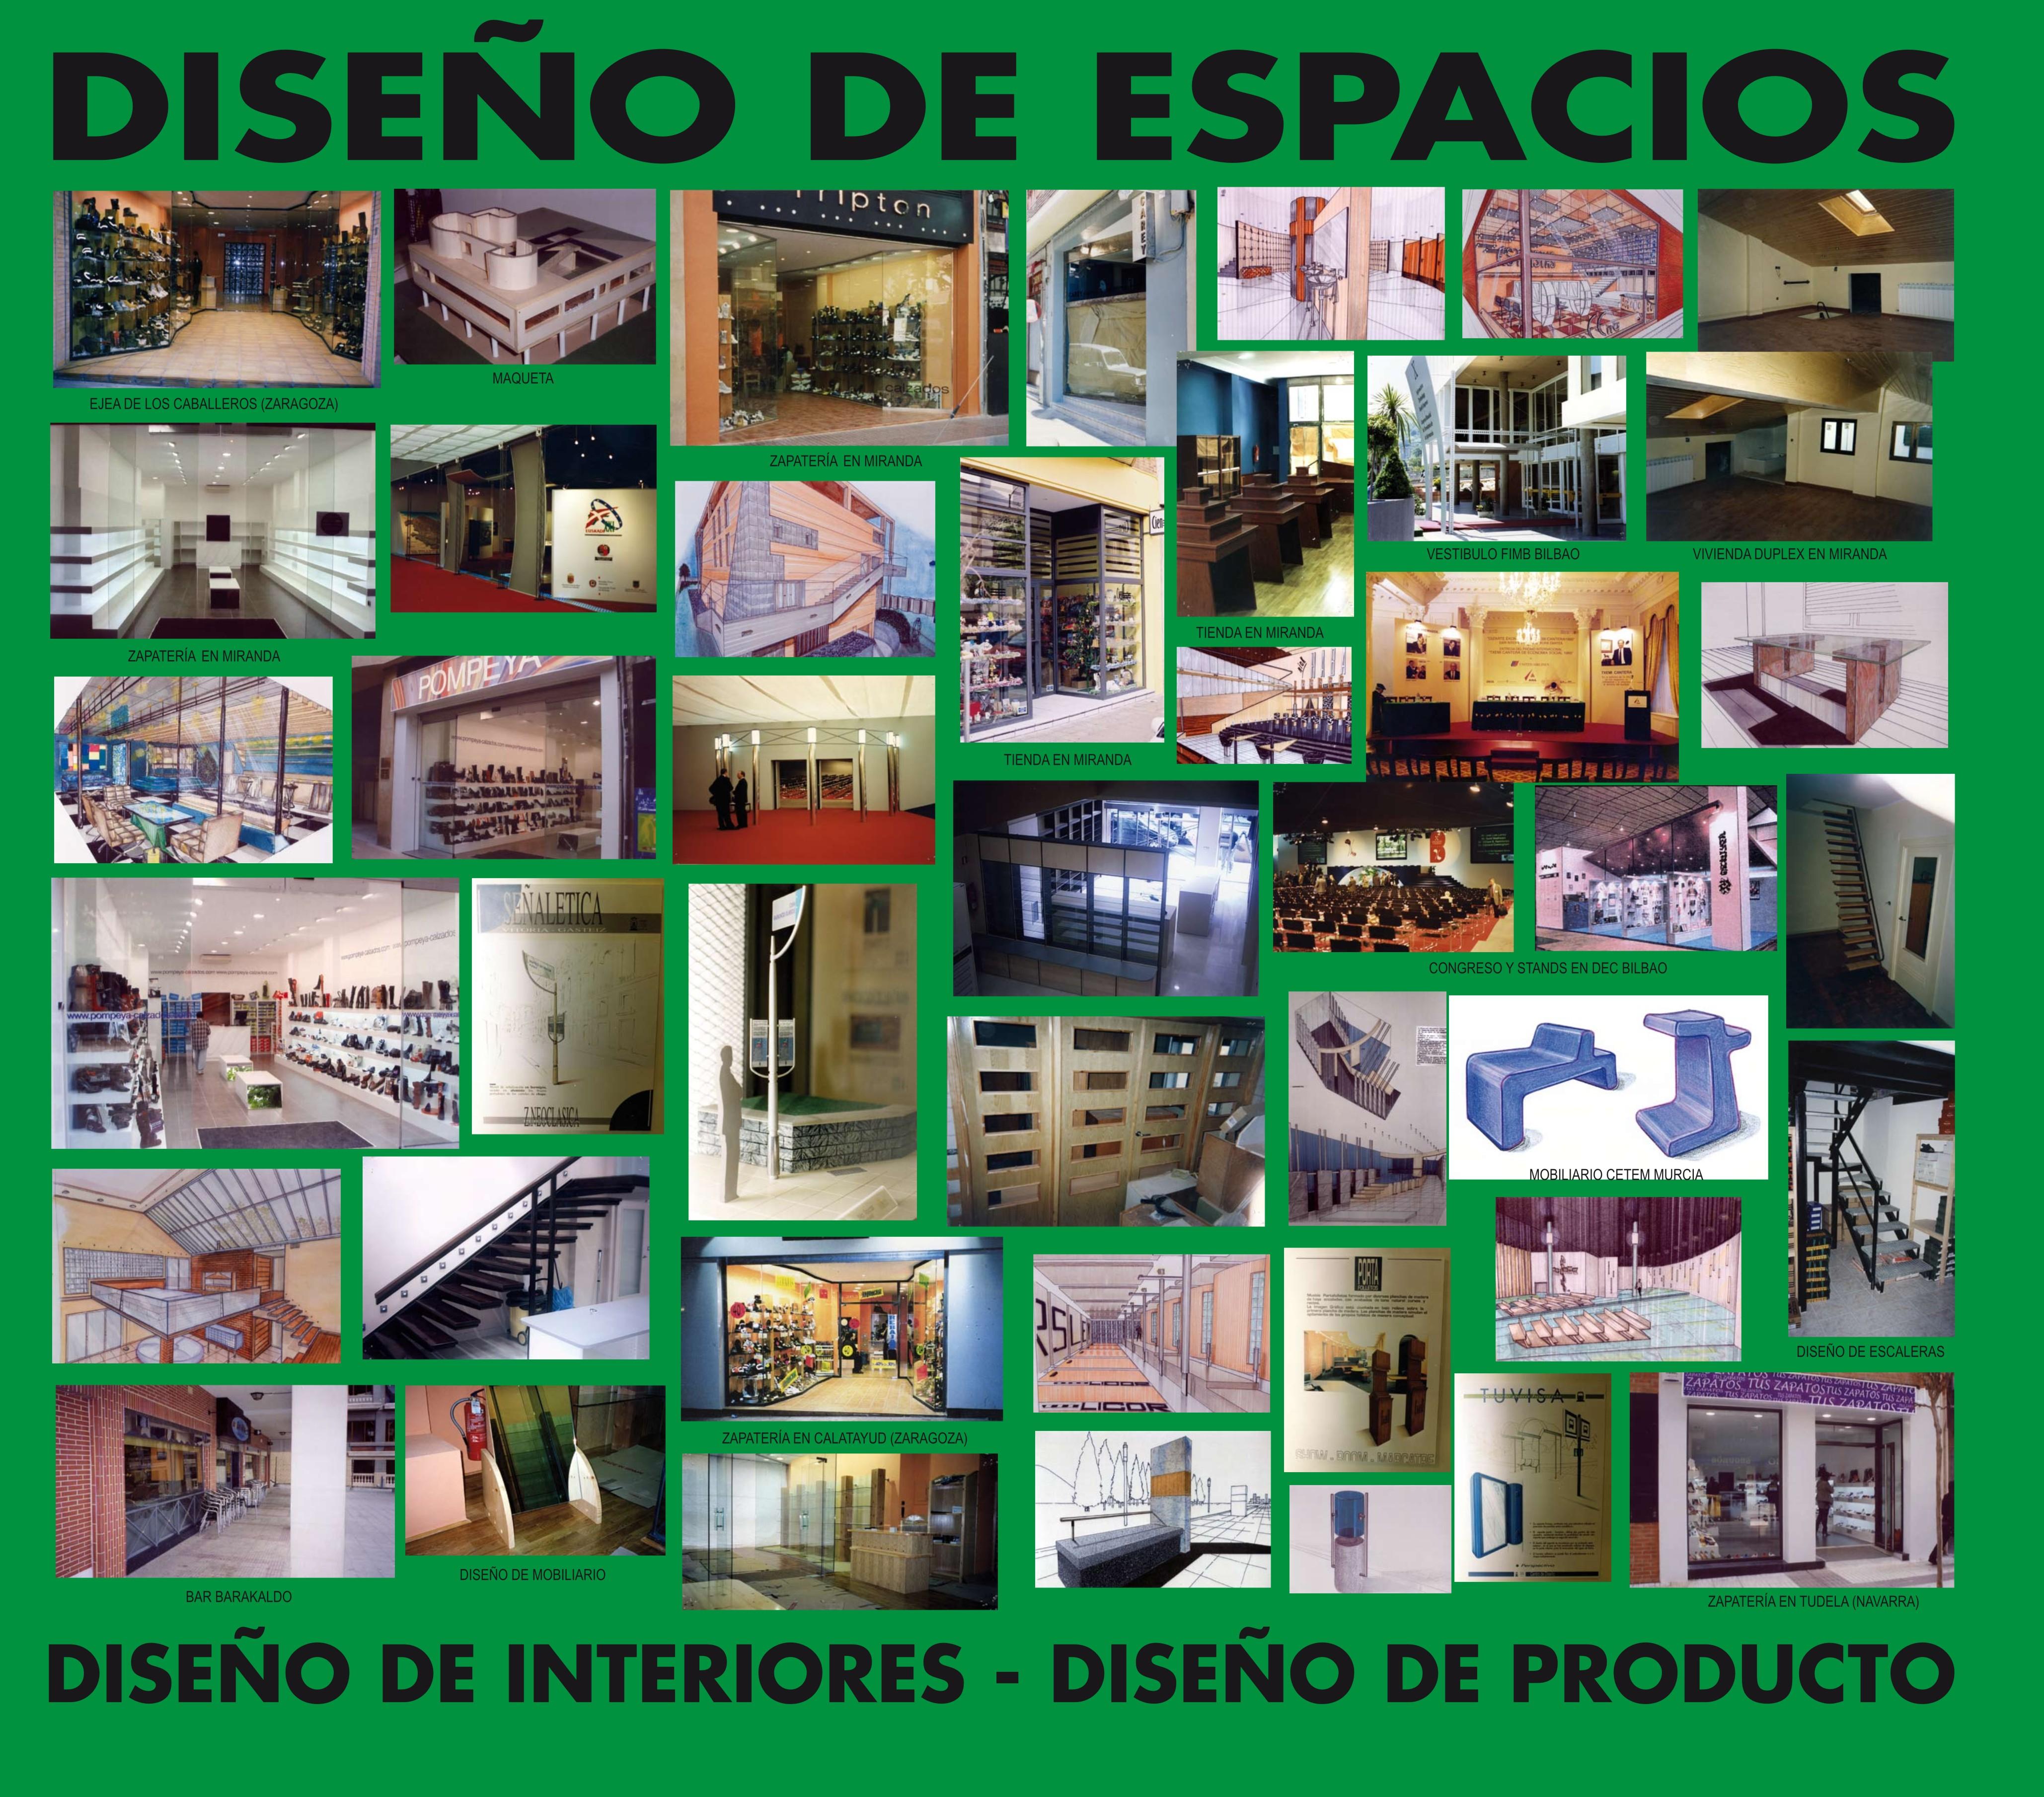 Estudio De Diseño Francisco J. Menéndez Cámara